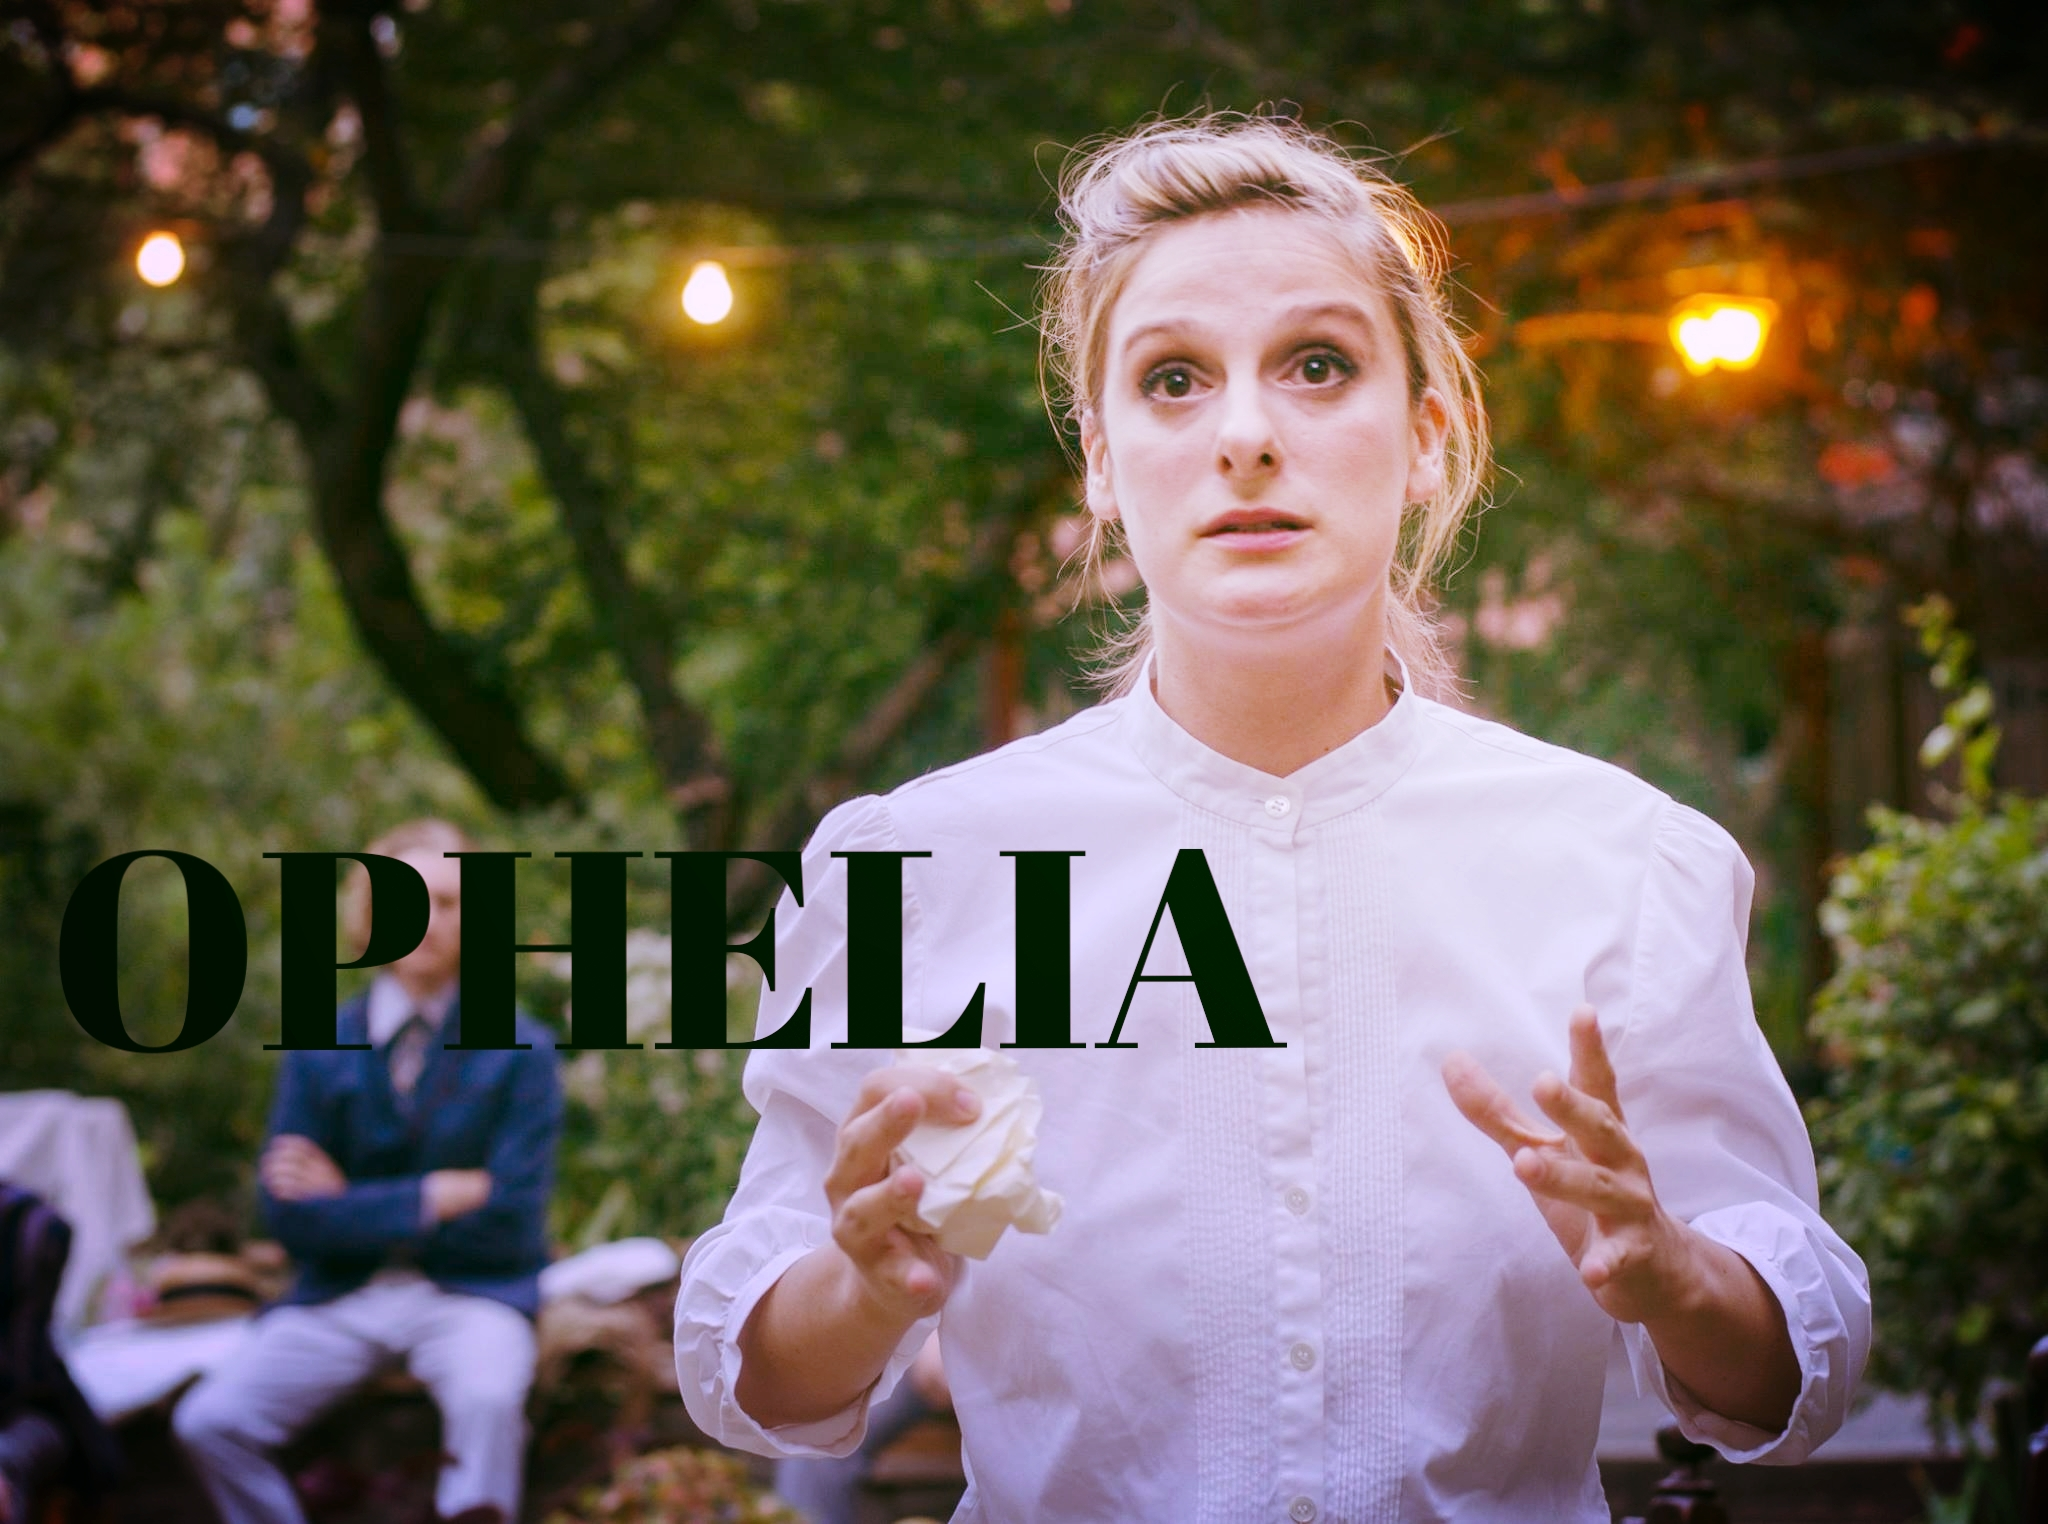 Ophelia horrified.jpg